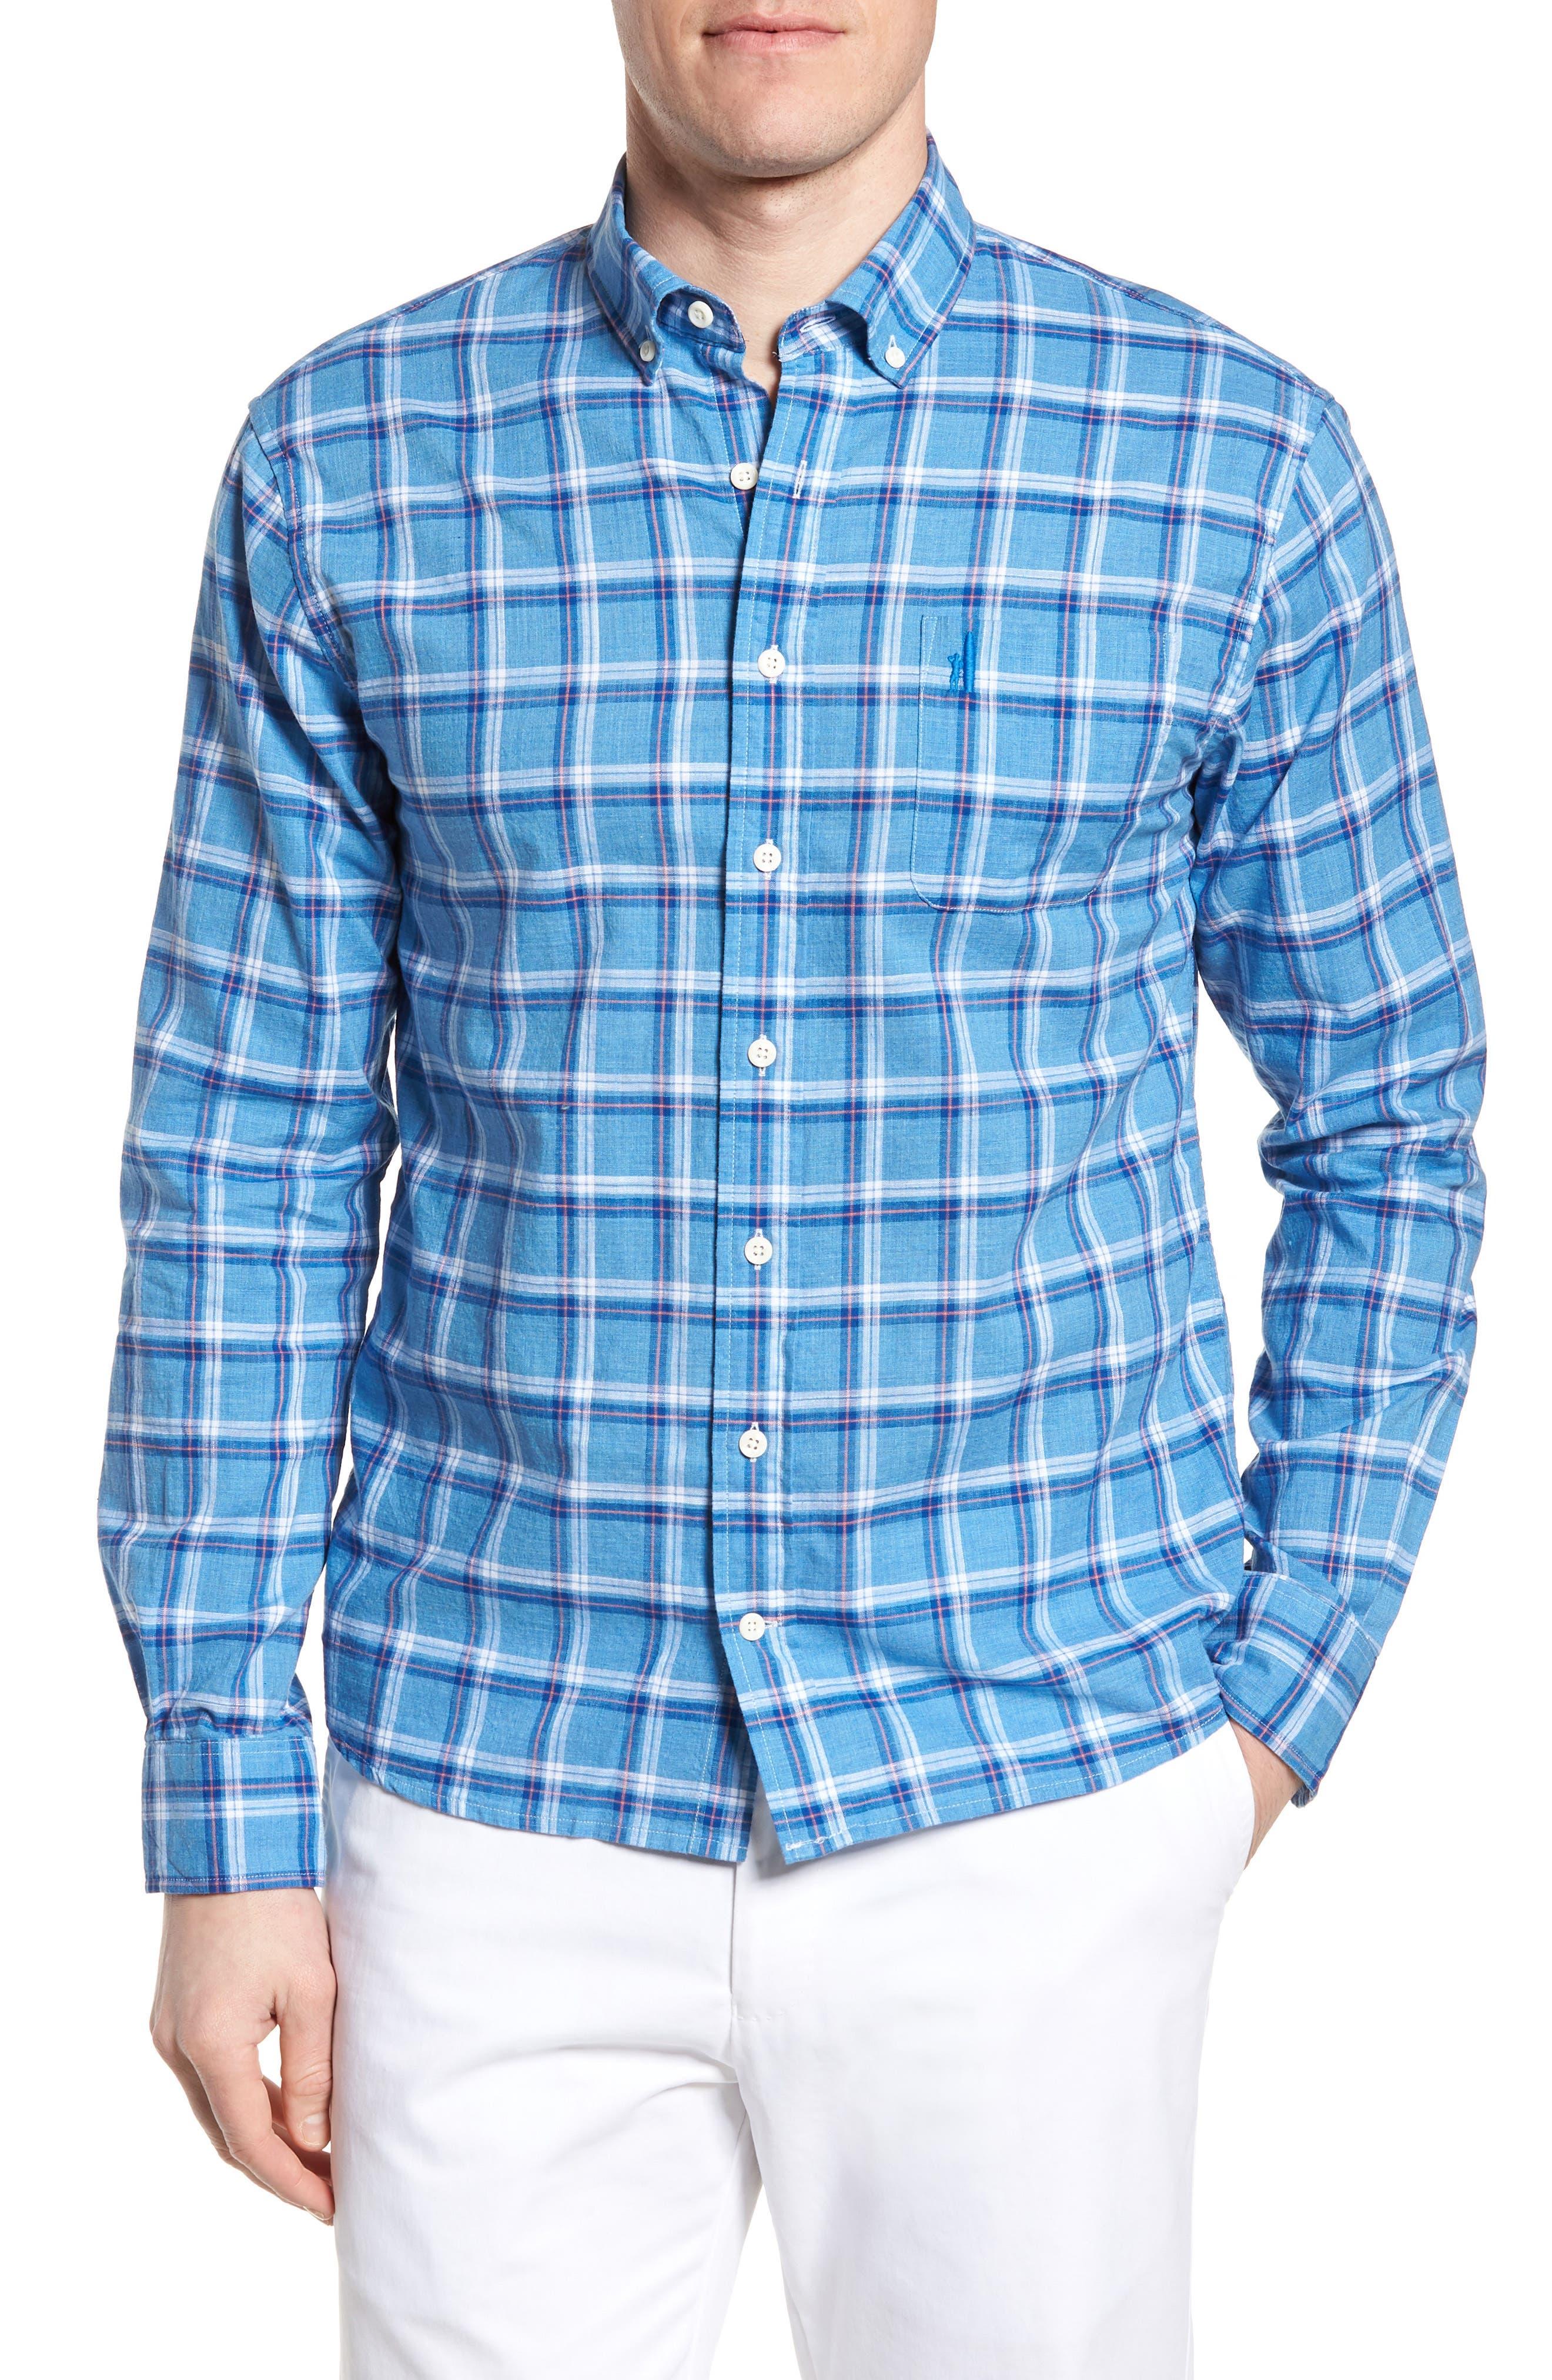 Davis Regular Fit Sport Shirt,                             Main thumbnail 1, color,                             200